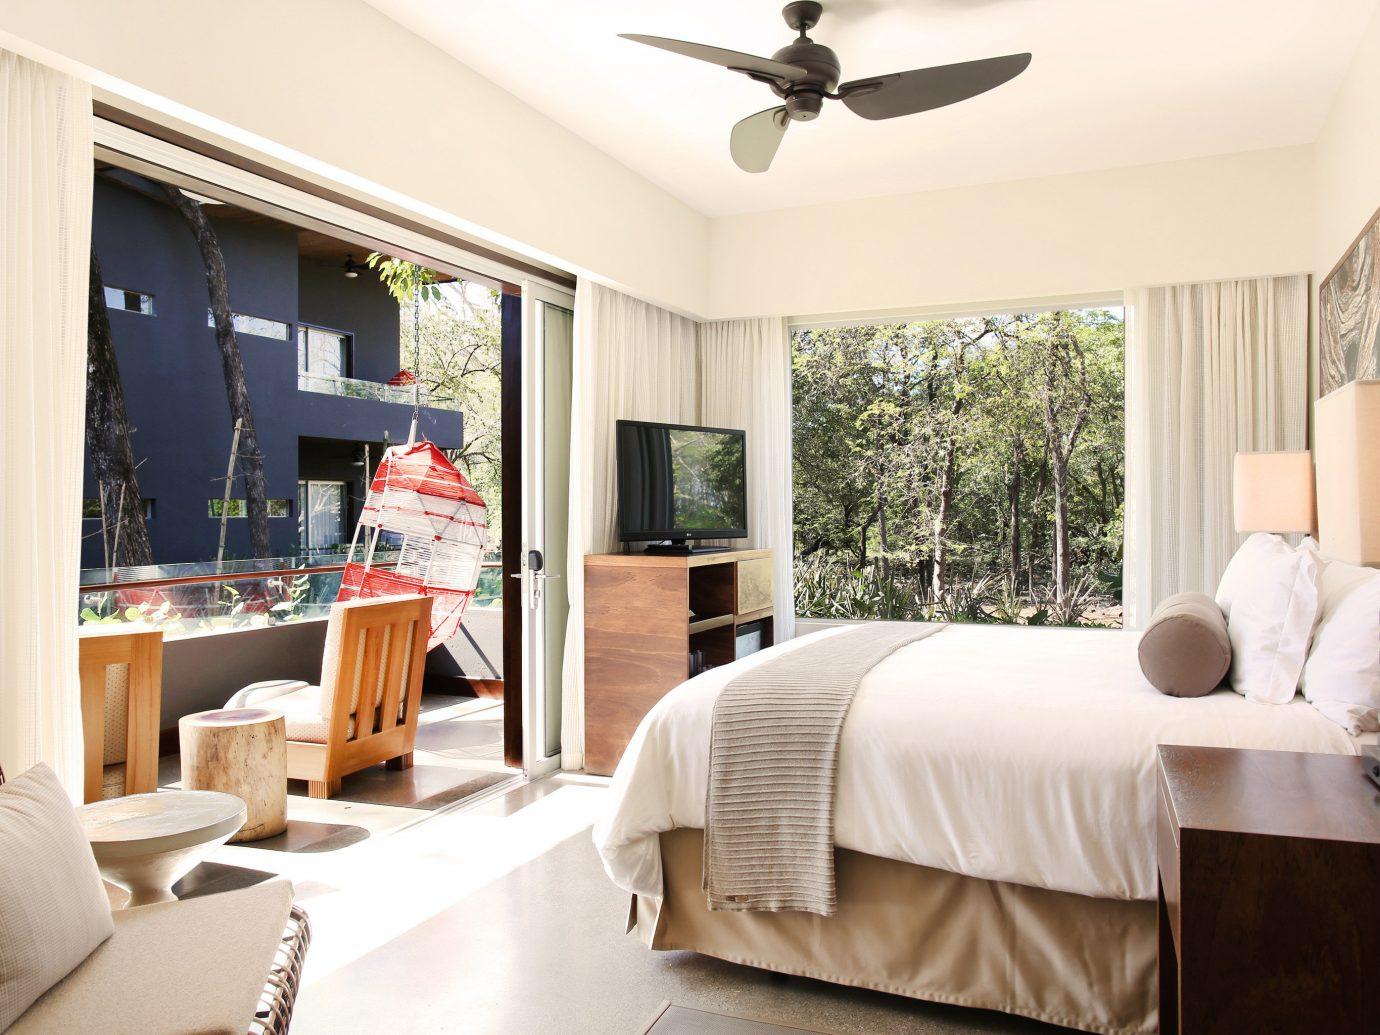 Bedroom At Guanacaste Hotel Papagayo, Costa Rica